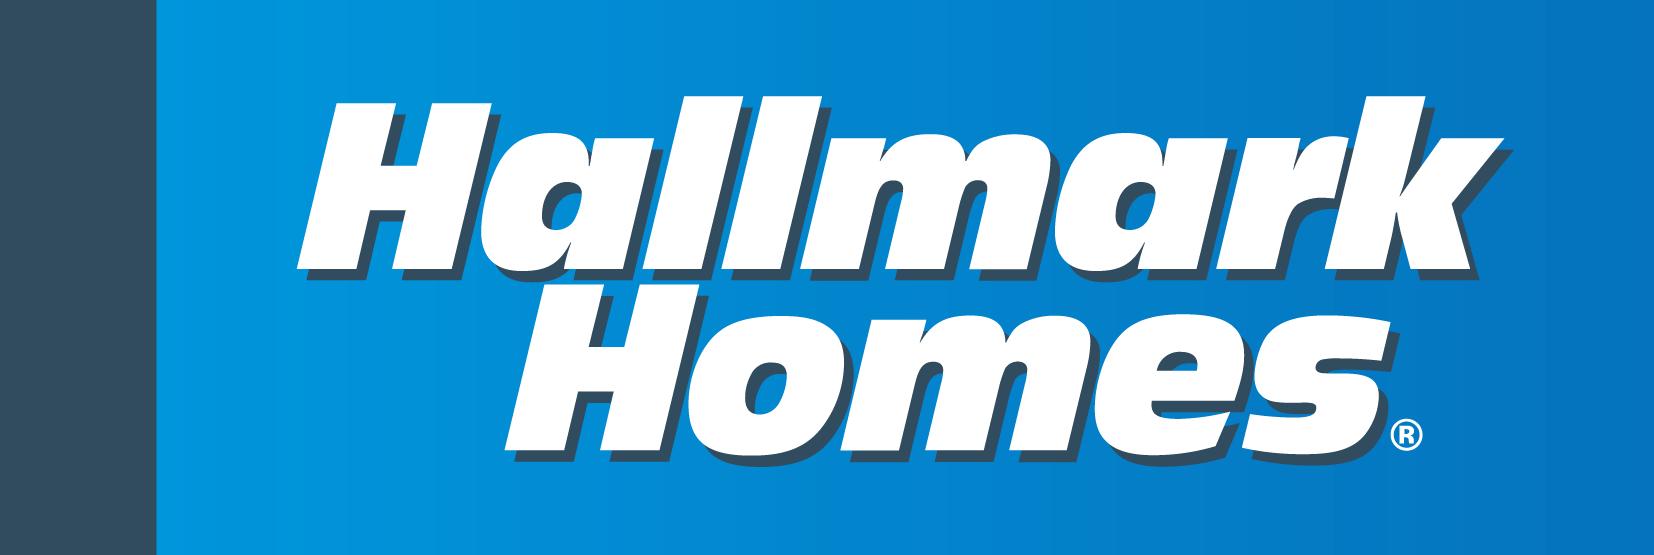 Hallmark Homes